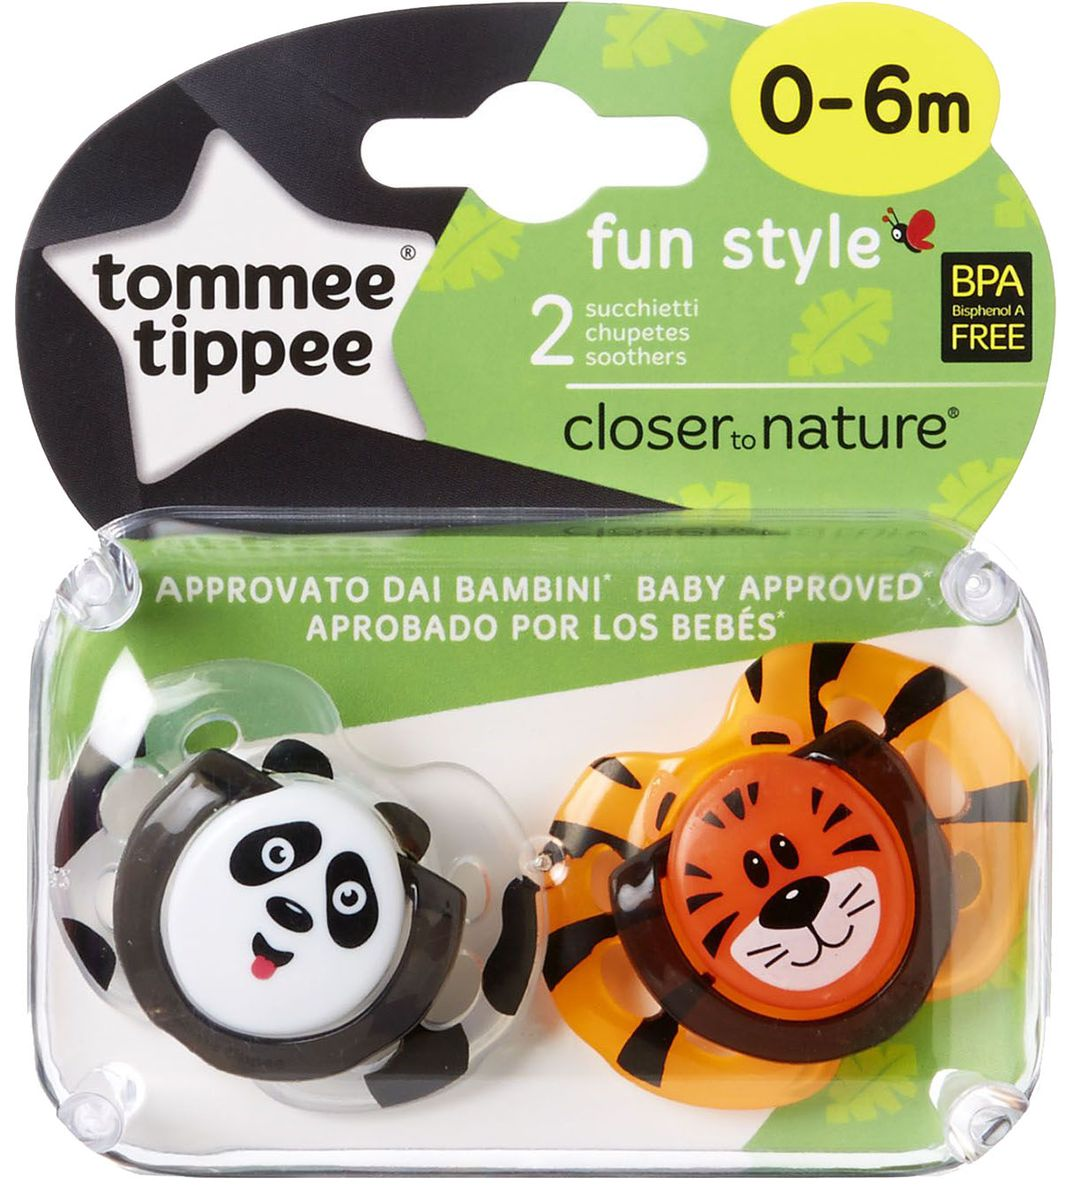 Tommee Tippee Пустышка Fun Style Веселые животные Панда Тигренок от 0 до 6 месяцев 2 шт